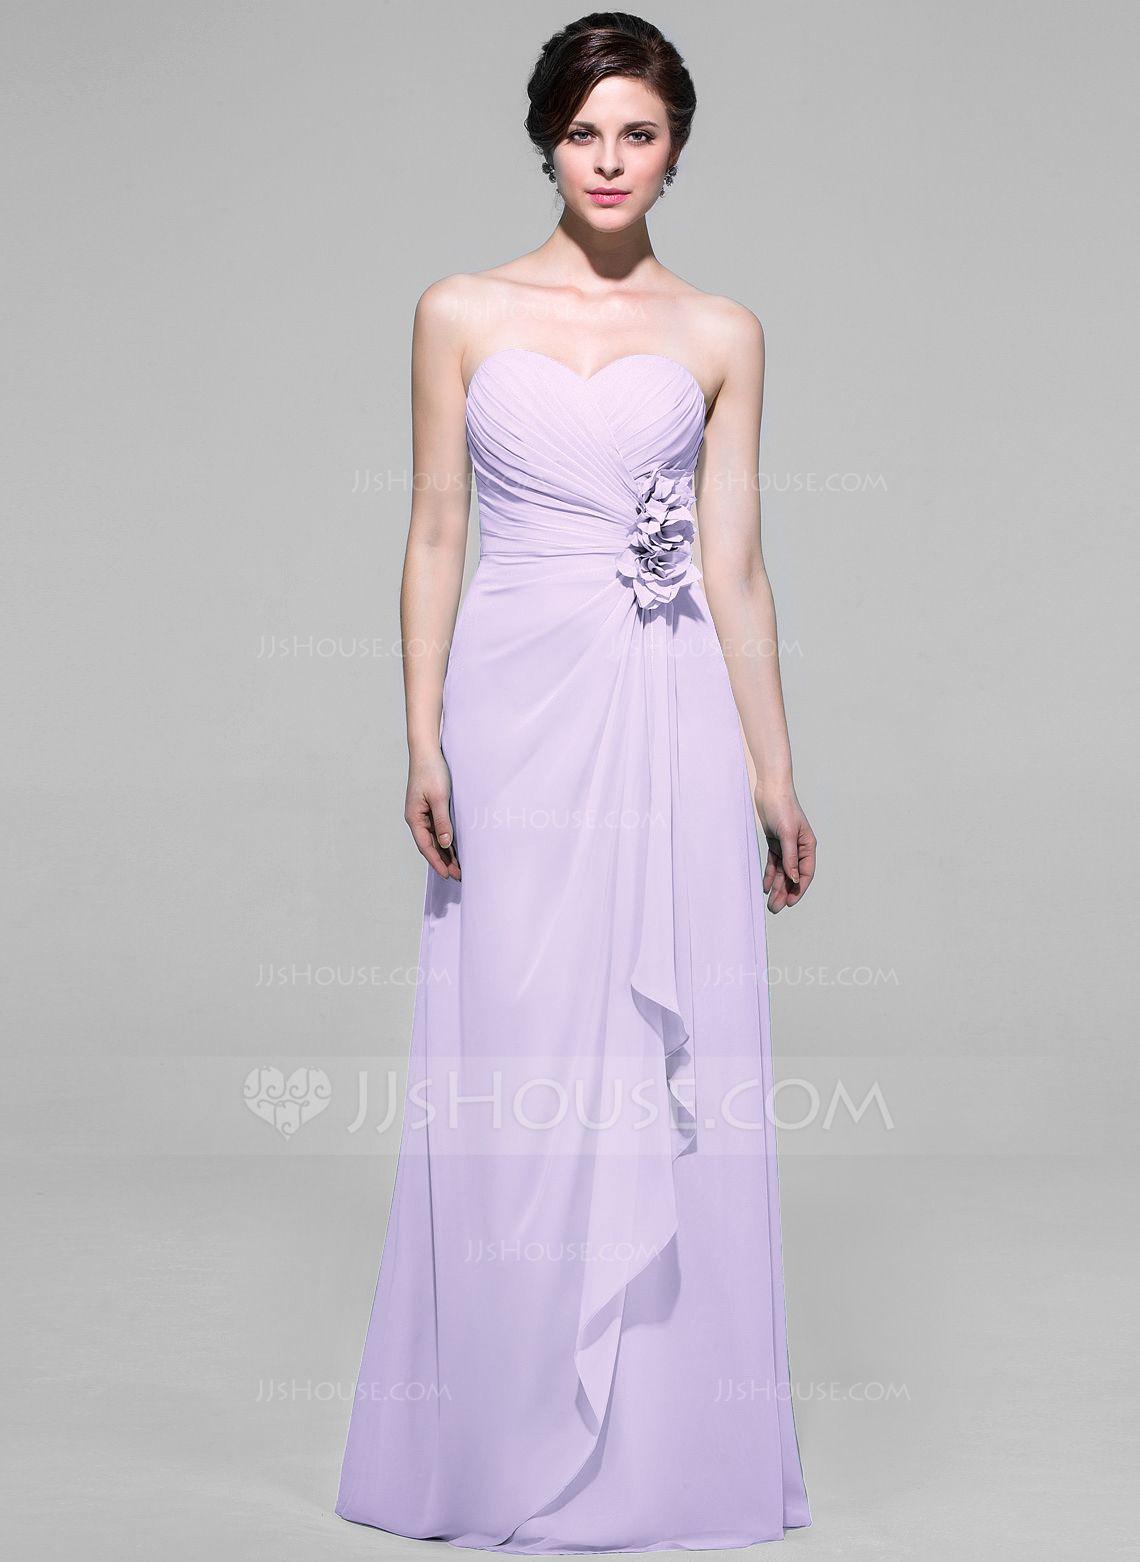 Alineprincess sweetheart floorlength chiffon bridesmaid dress